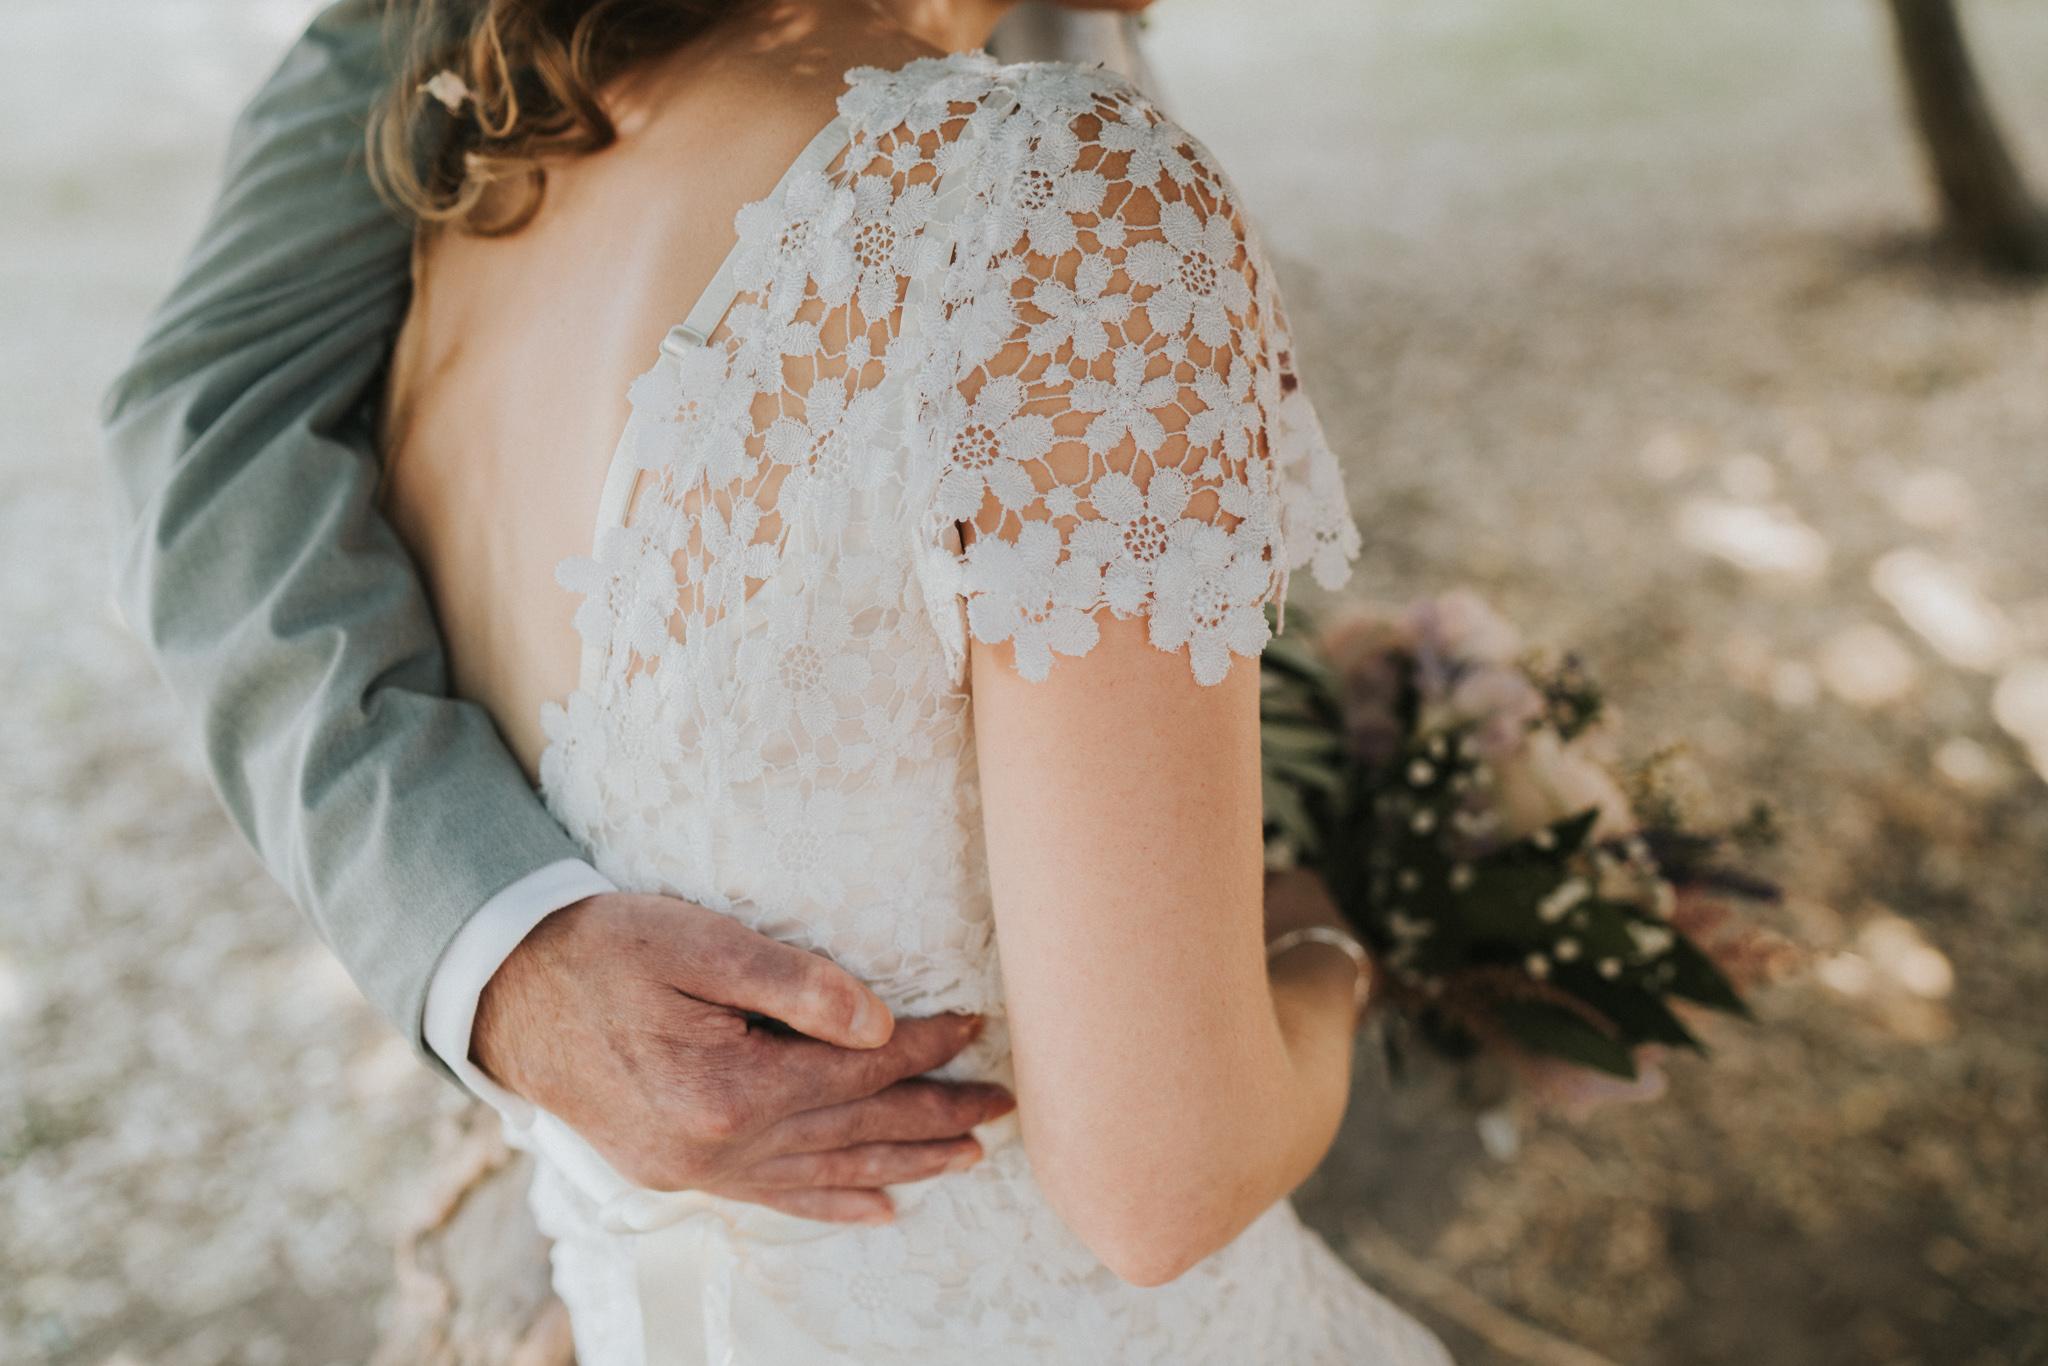 Georgie-Ketu-Firstsite-Wedding-Colchester-Essex-Grace-Elizabeth-Alternative-Wedding-Photographer (1 of 1).jpg (1 of 1).jpg